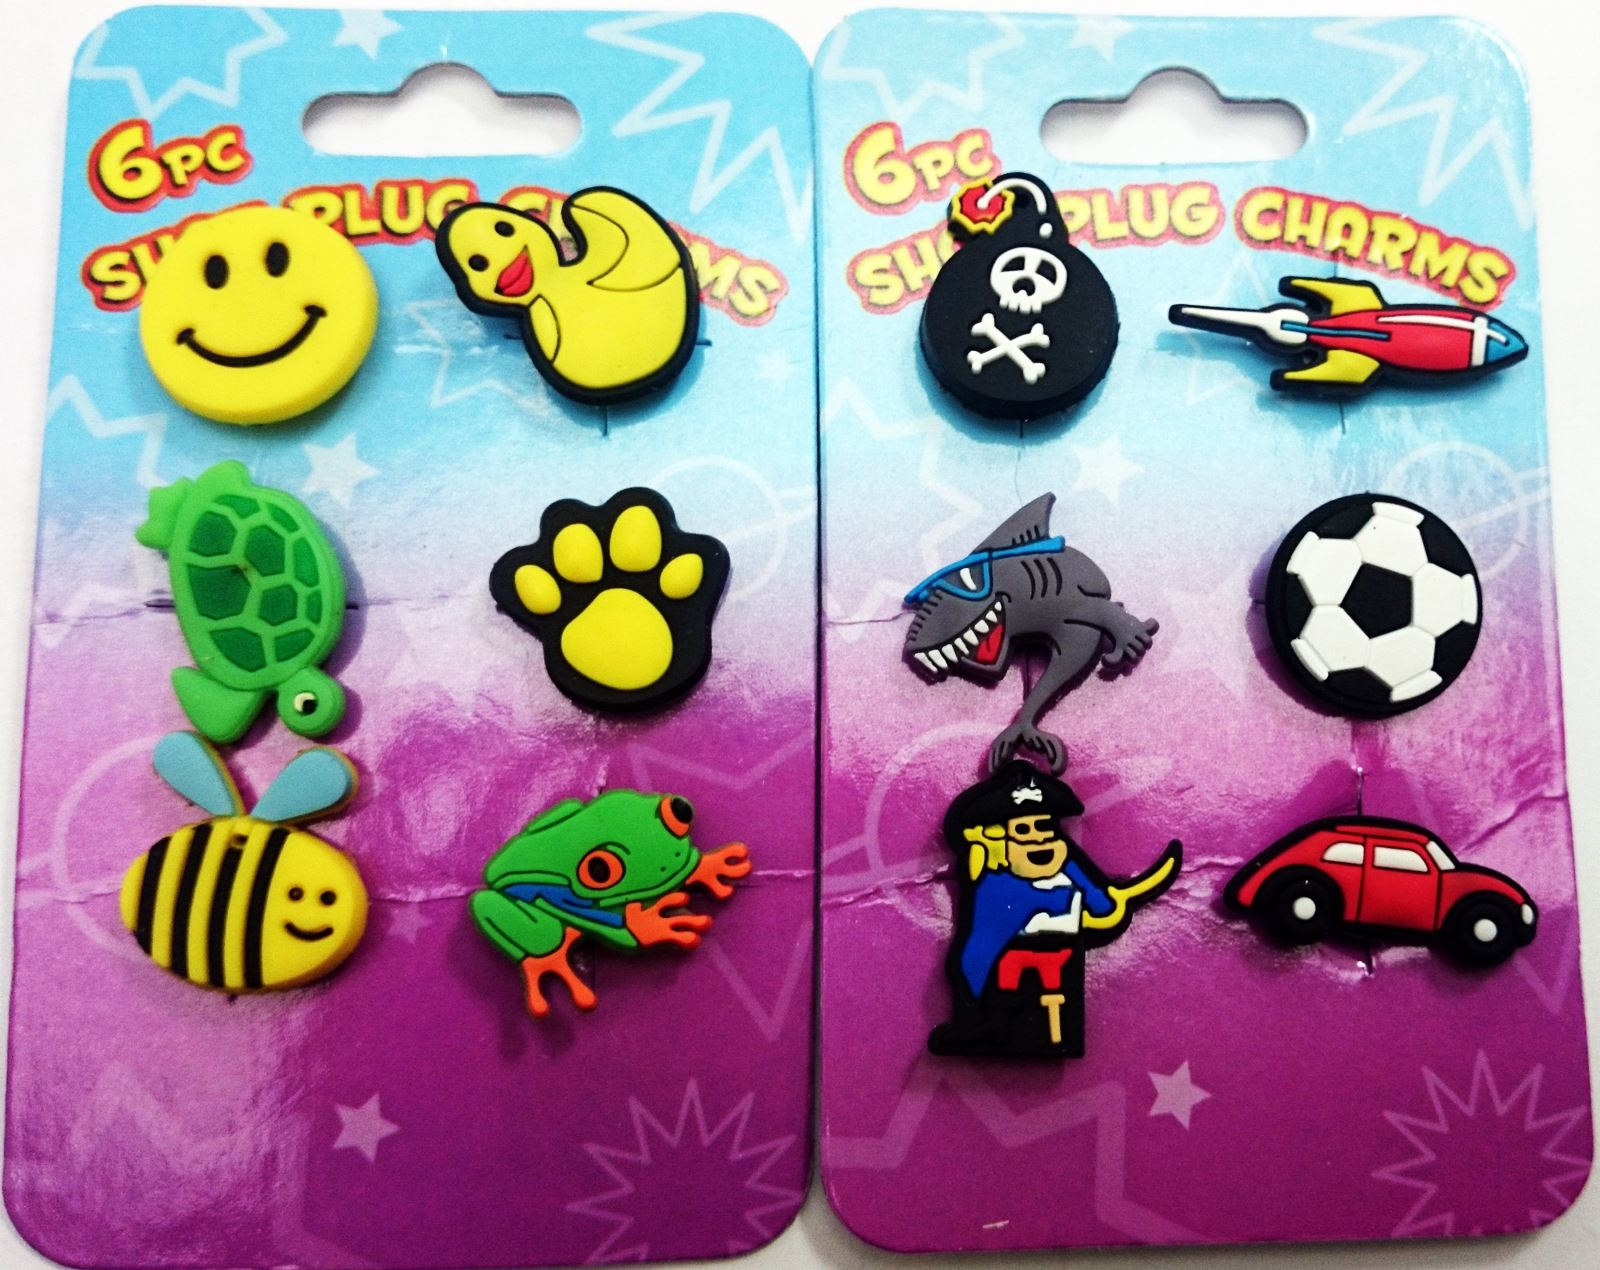 34f6a35b695cc Shoe Charm Plug Crocs Clogs Sticker Funny Clips Kid Party Bag Favour Wrist  Band